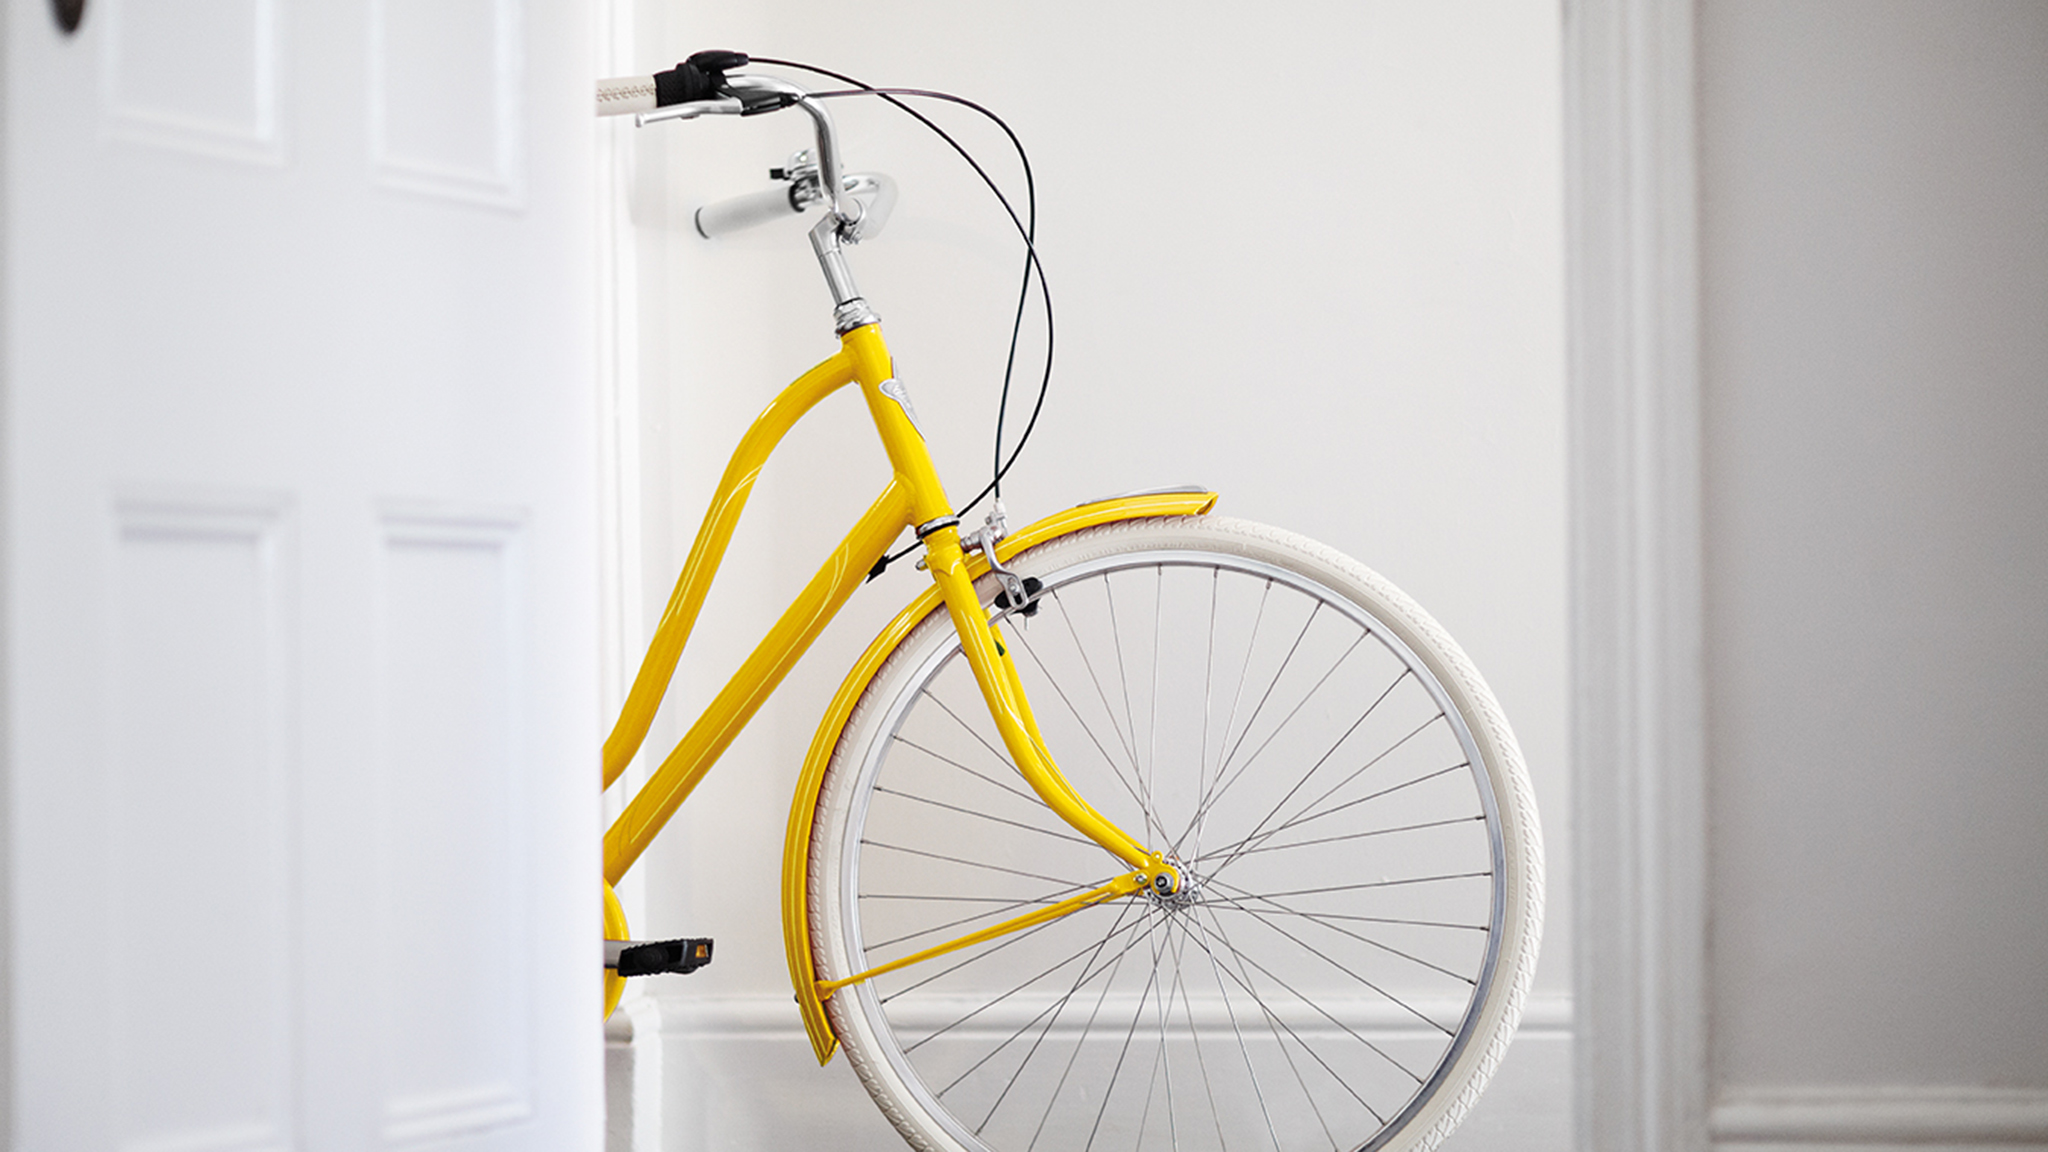 RW_KH_Bike_L_HR (1)